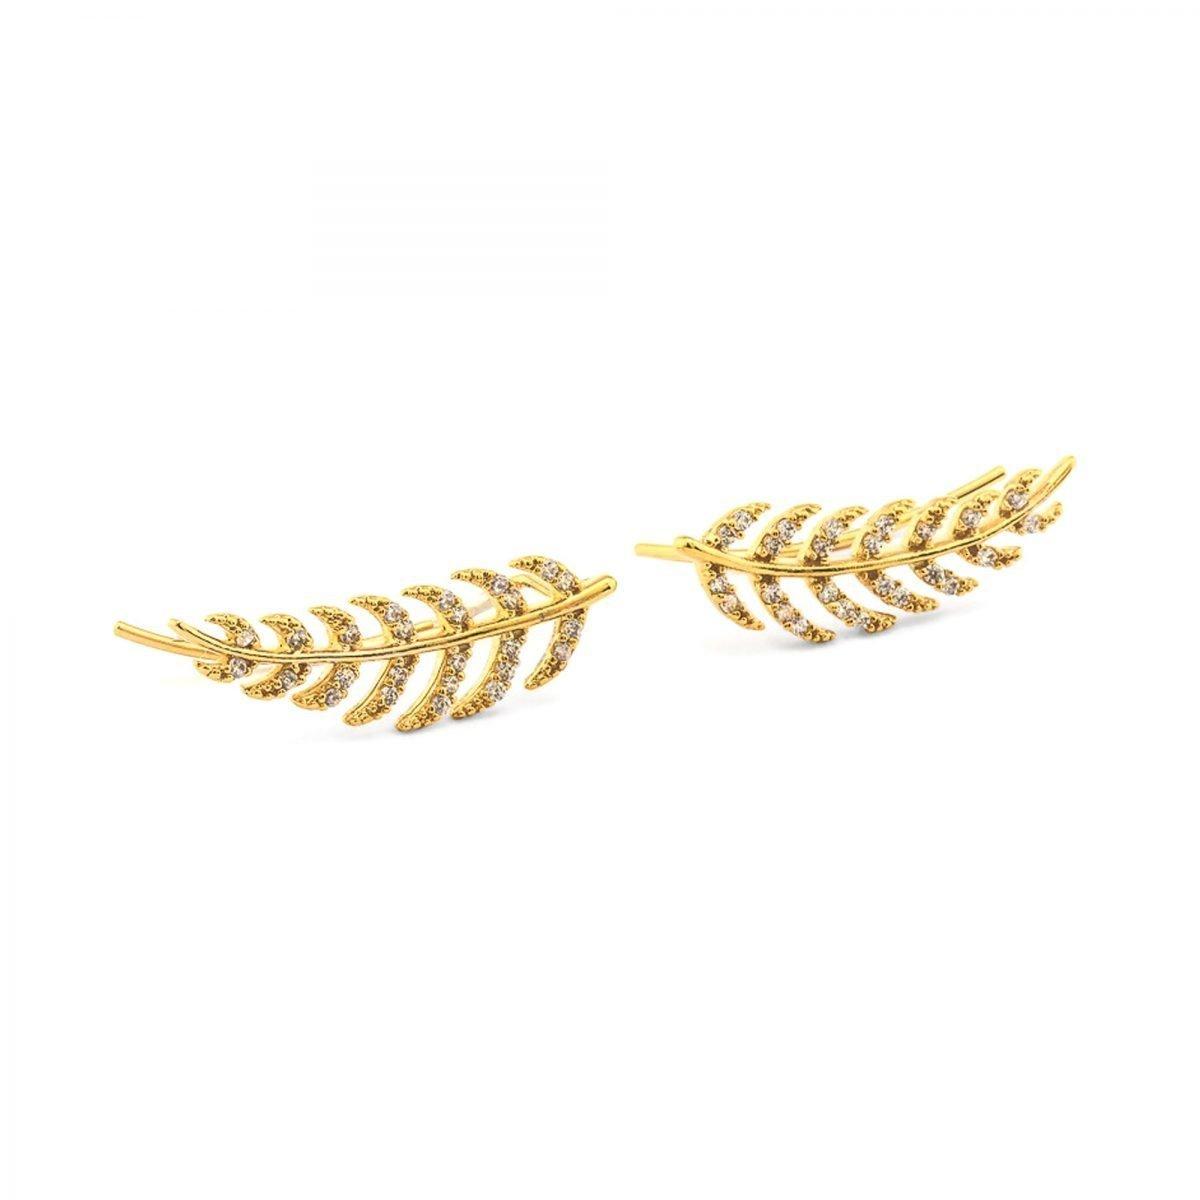 Ear Femme Leaf Crawler - 12k gold plated